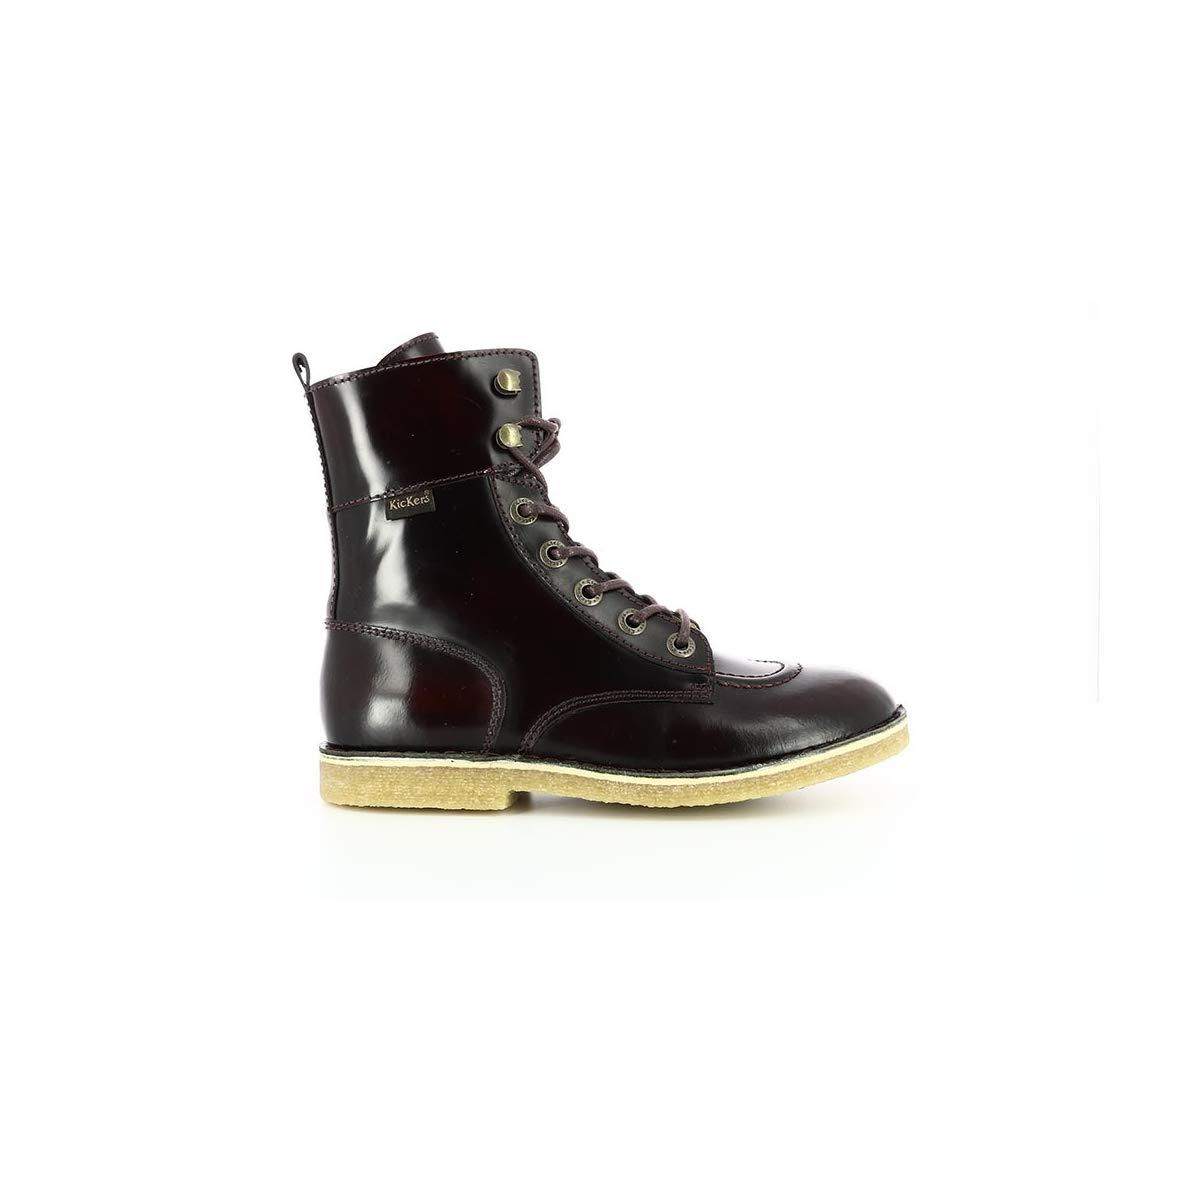 237db6df6ddaf4 Kickers Range, Bottillon Femme,: Amazon.fr: Chaussures et Sacs